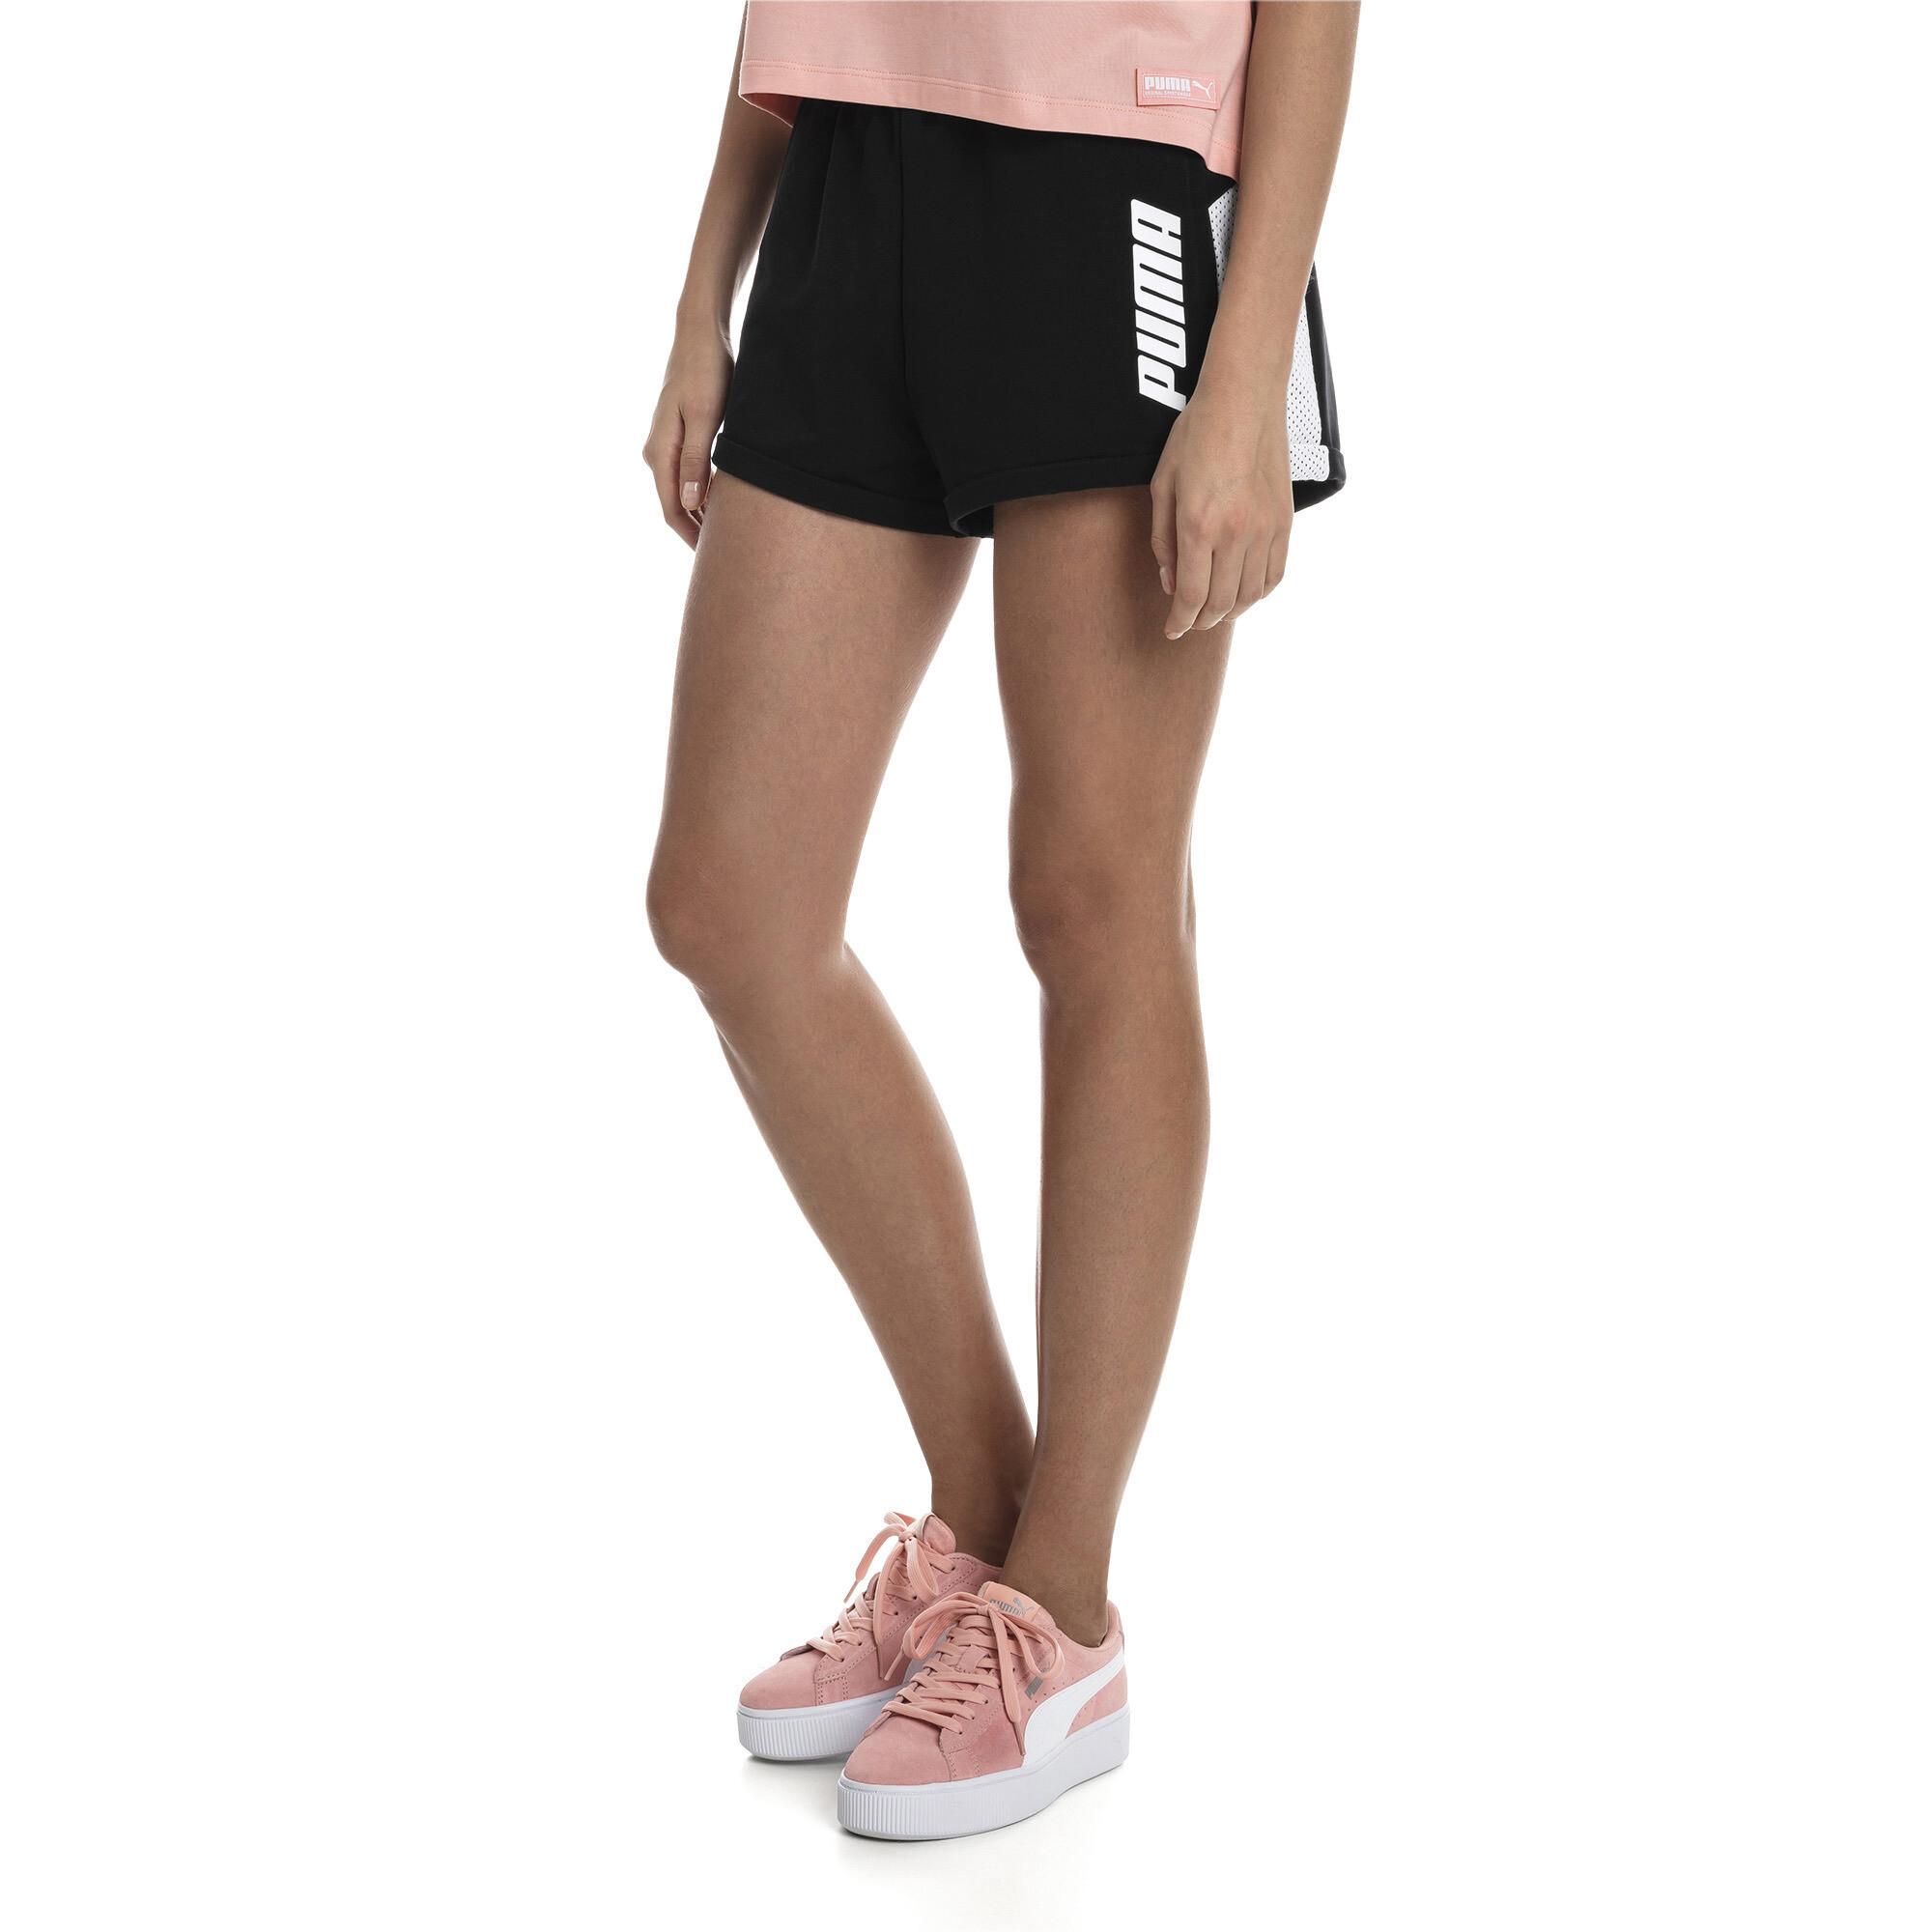 PUMA-Modern-Sports-Damen-Shorts-Frauen-Shorts-Basics-Neu Indexbild 4